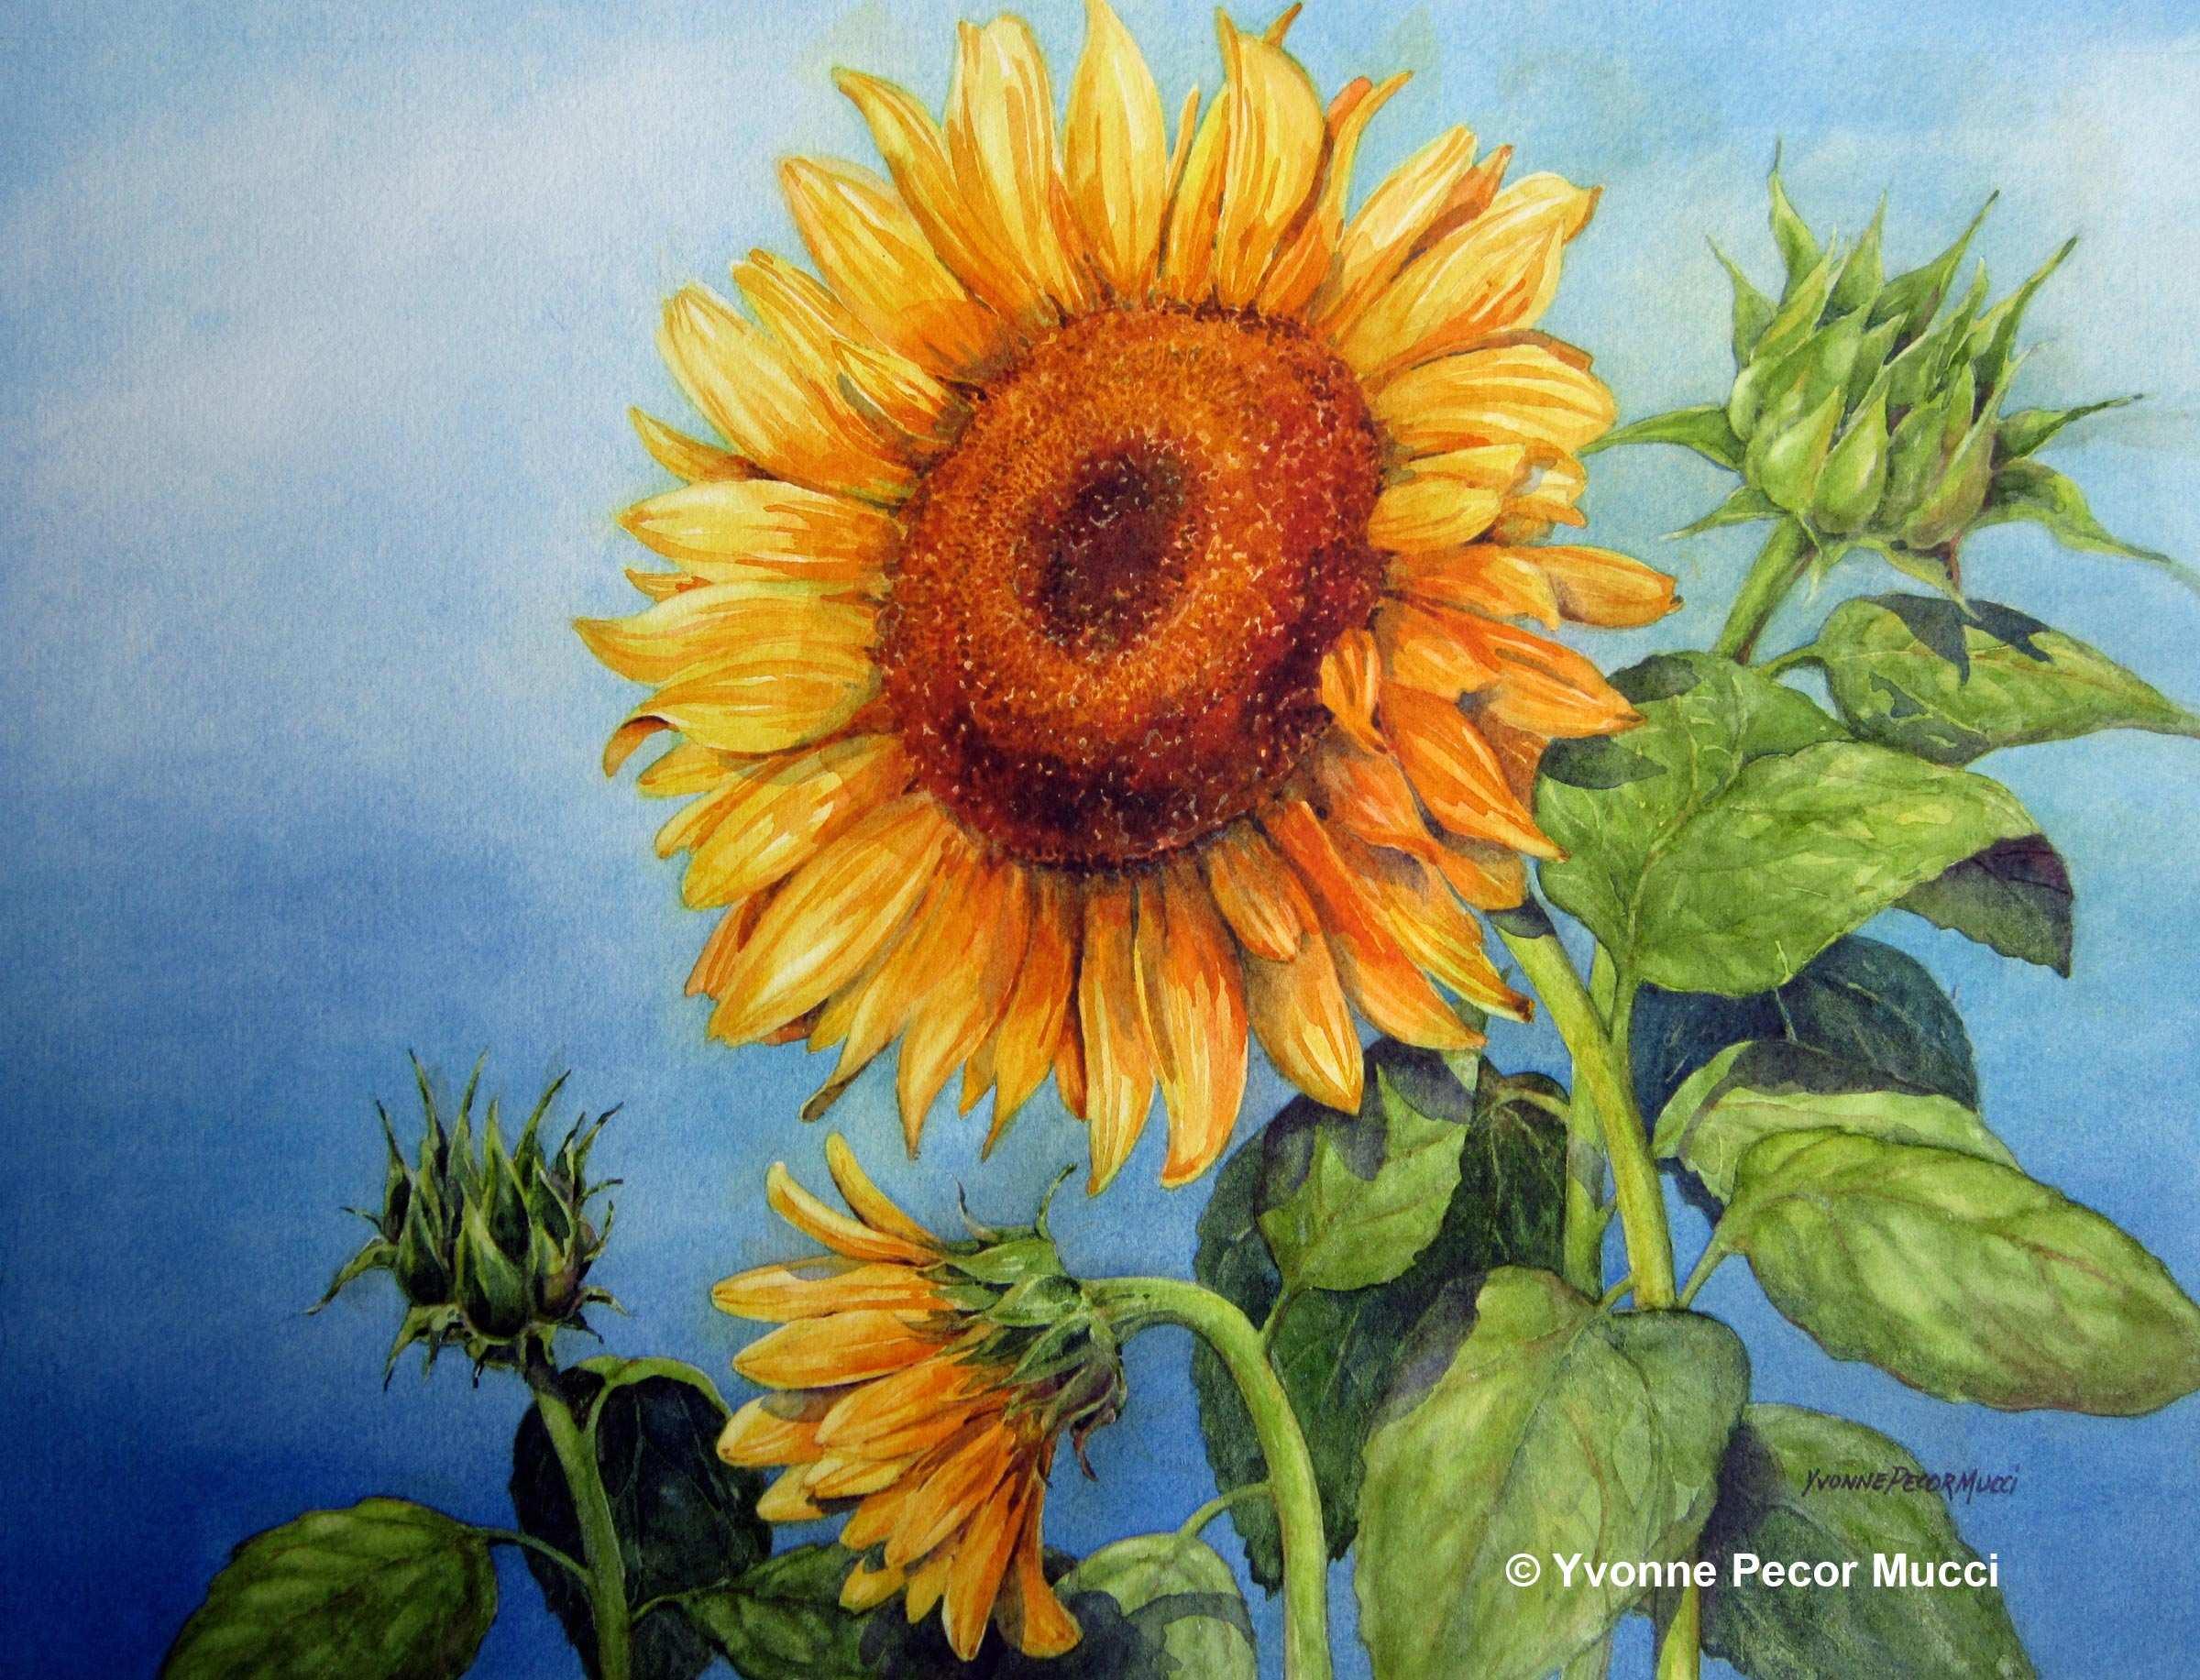 2400x1833 Sunflower Painting Elegant Sunflowers Watercolor Painting Ideas